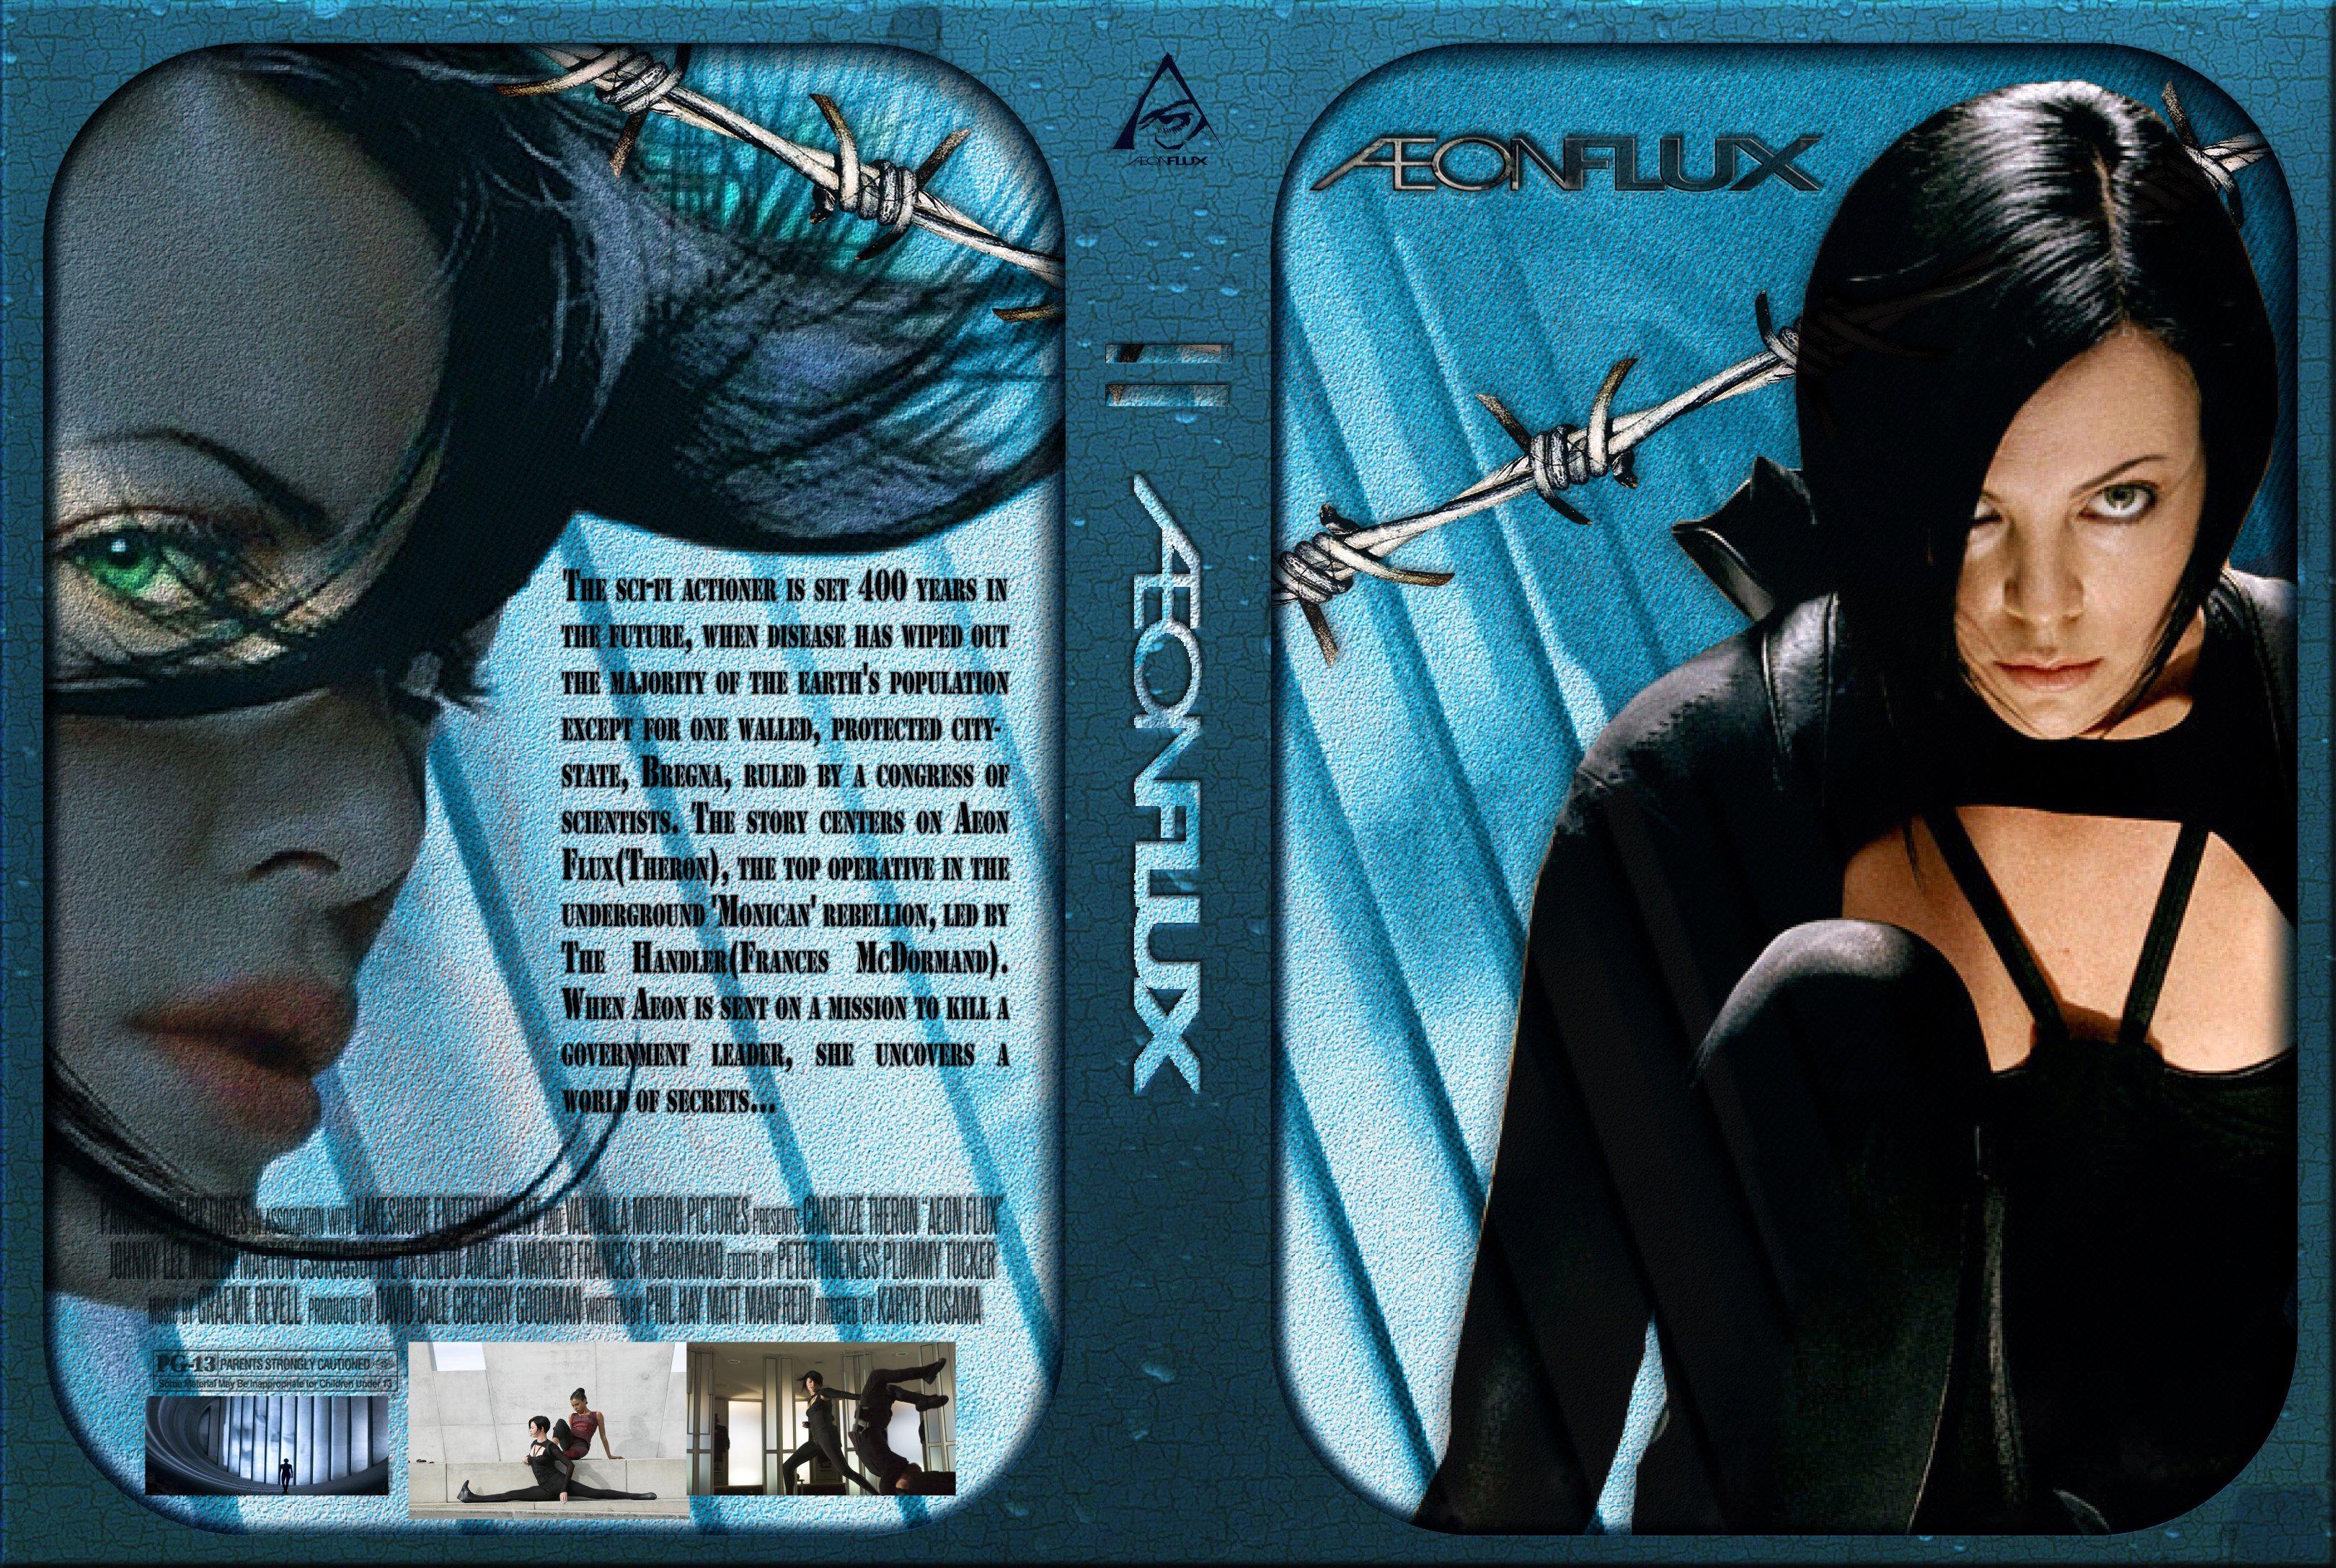 aeon flux movie download in english